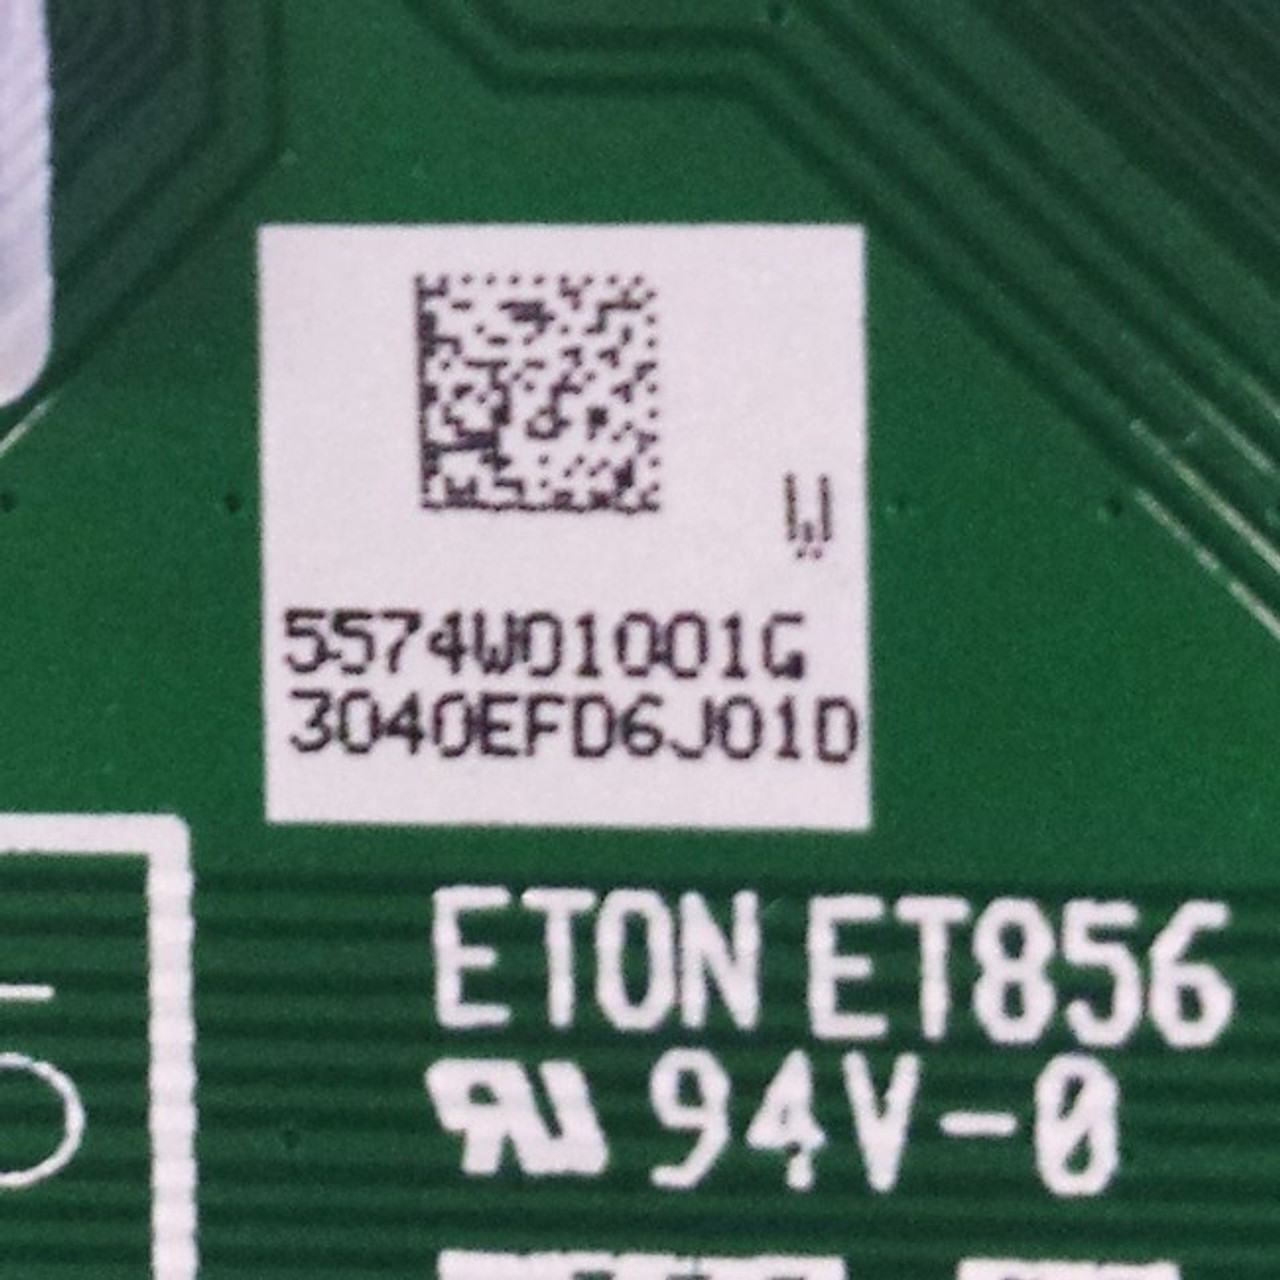 VIZIO, E502AR, MAIN BOARD, 55.74W01.001G, 48.74N02.011